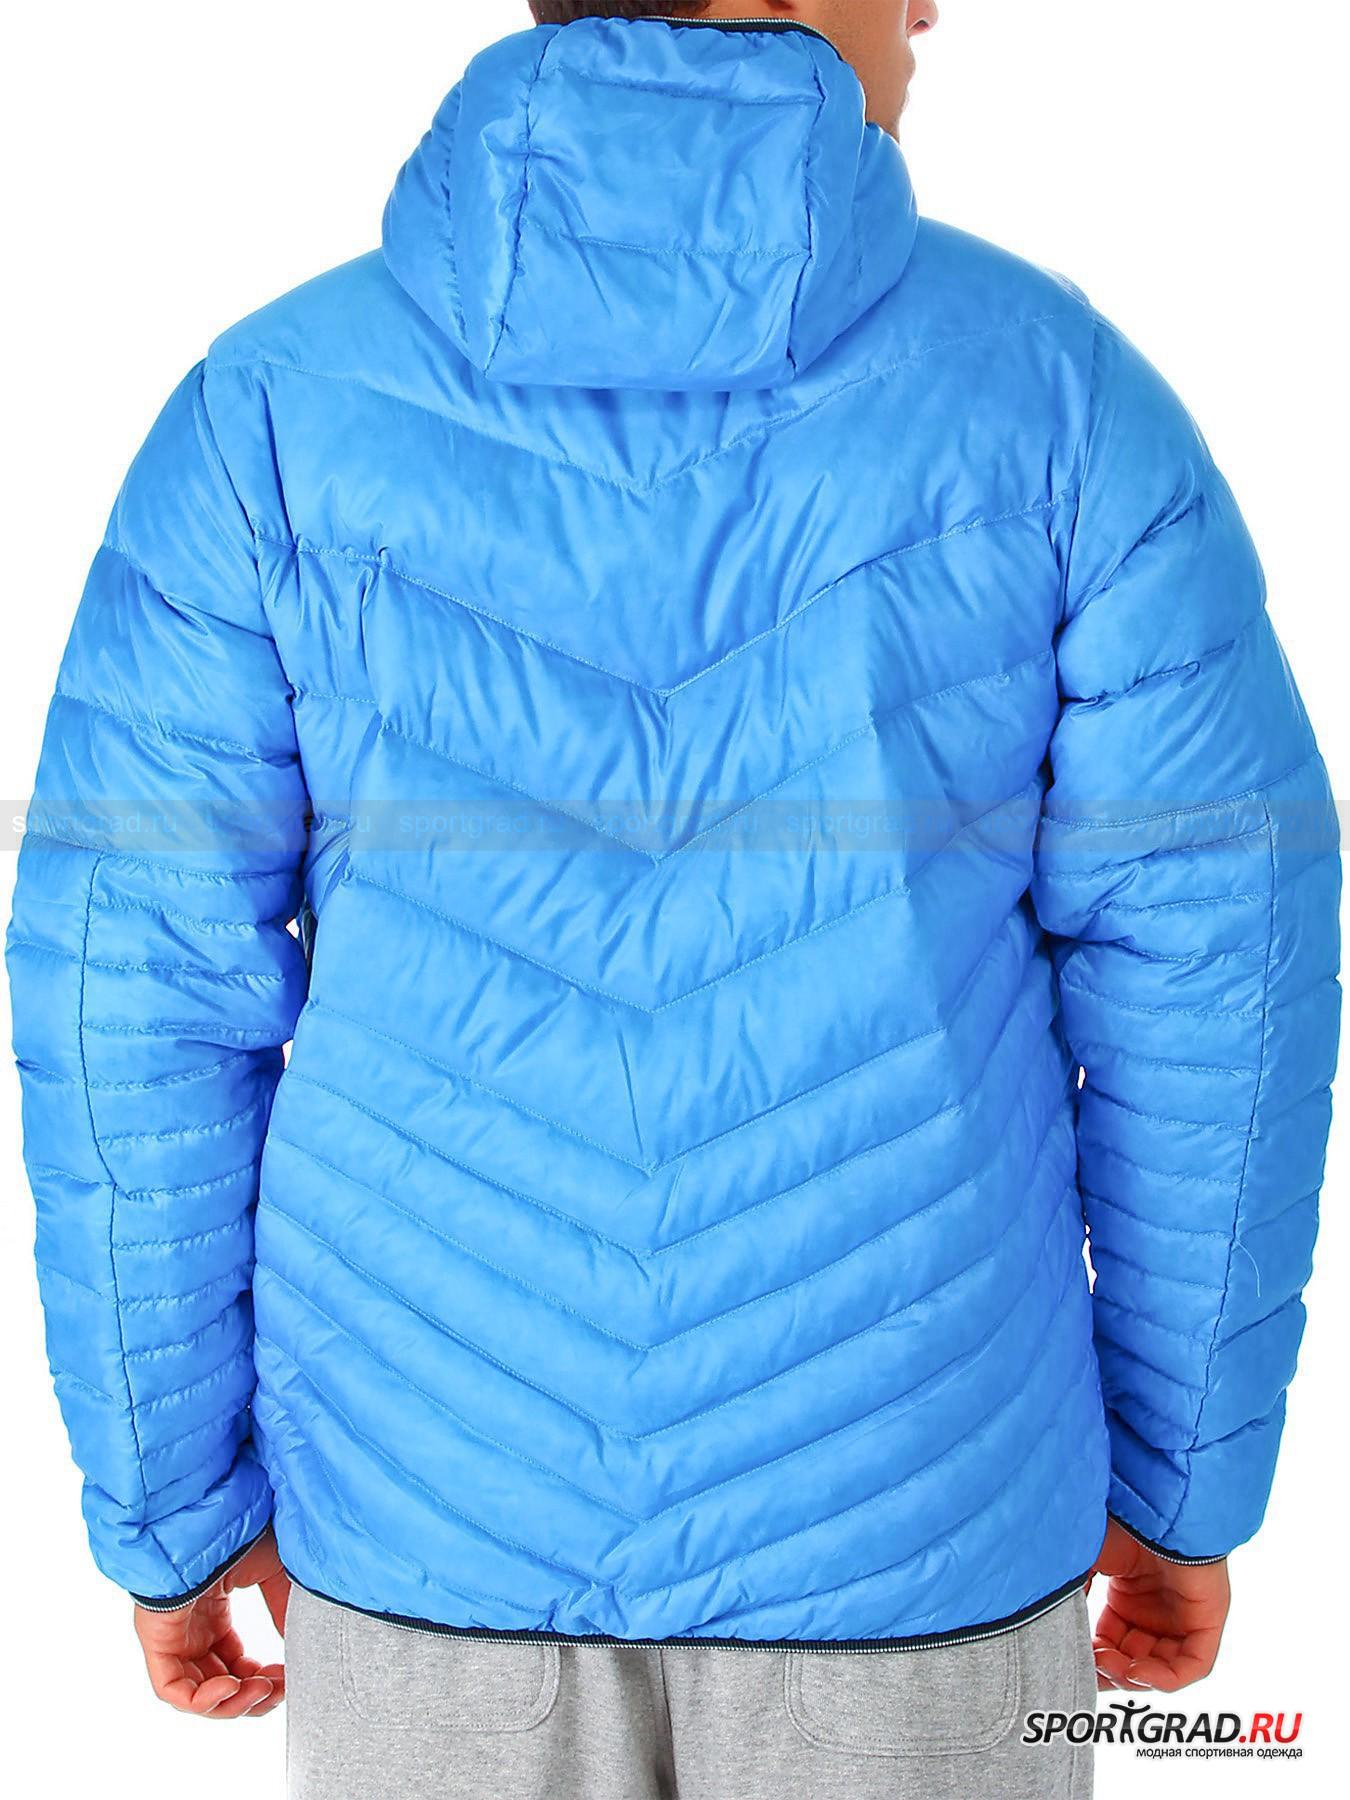 Куртка  мужcкая NIKE CASCADE JACKET-700 HOODED NIKE от Спортград